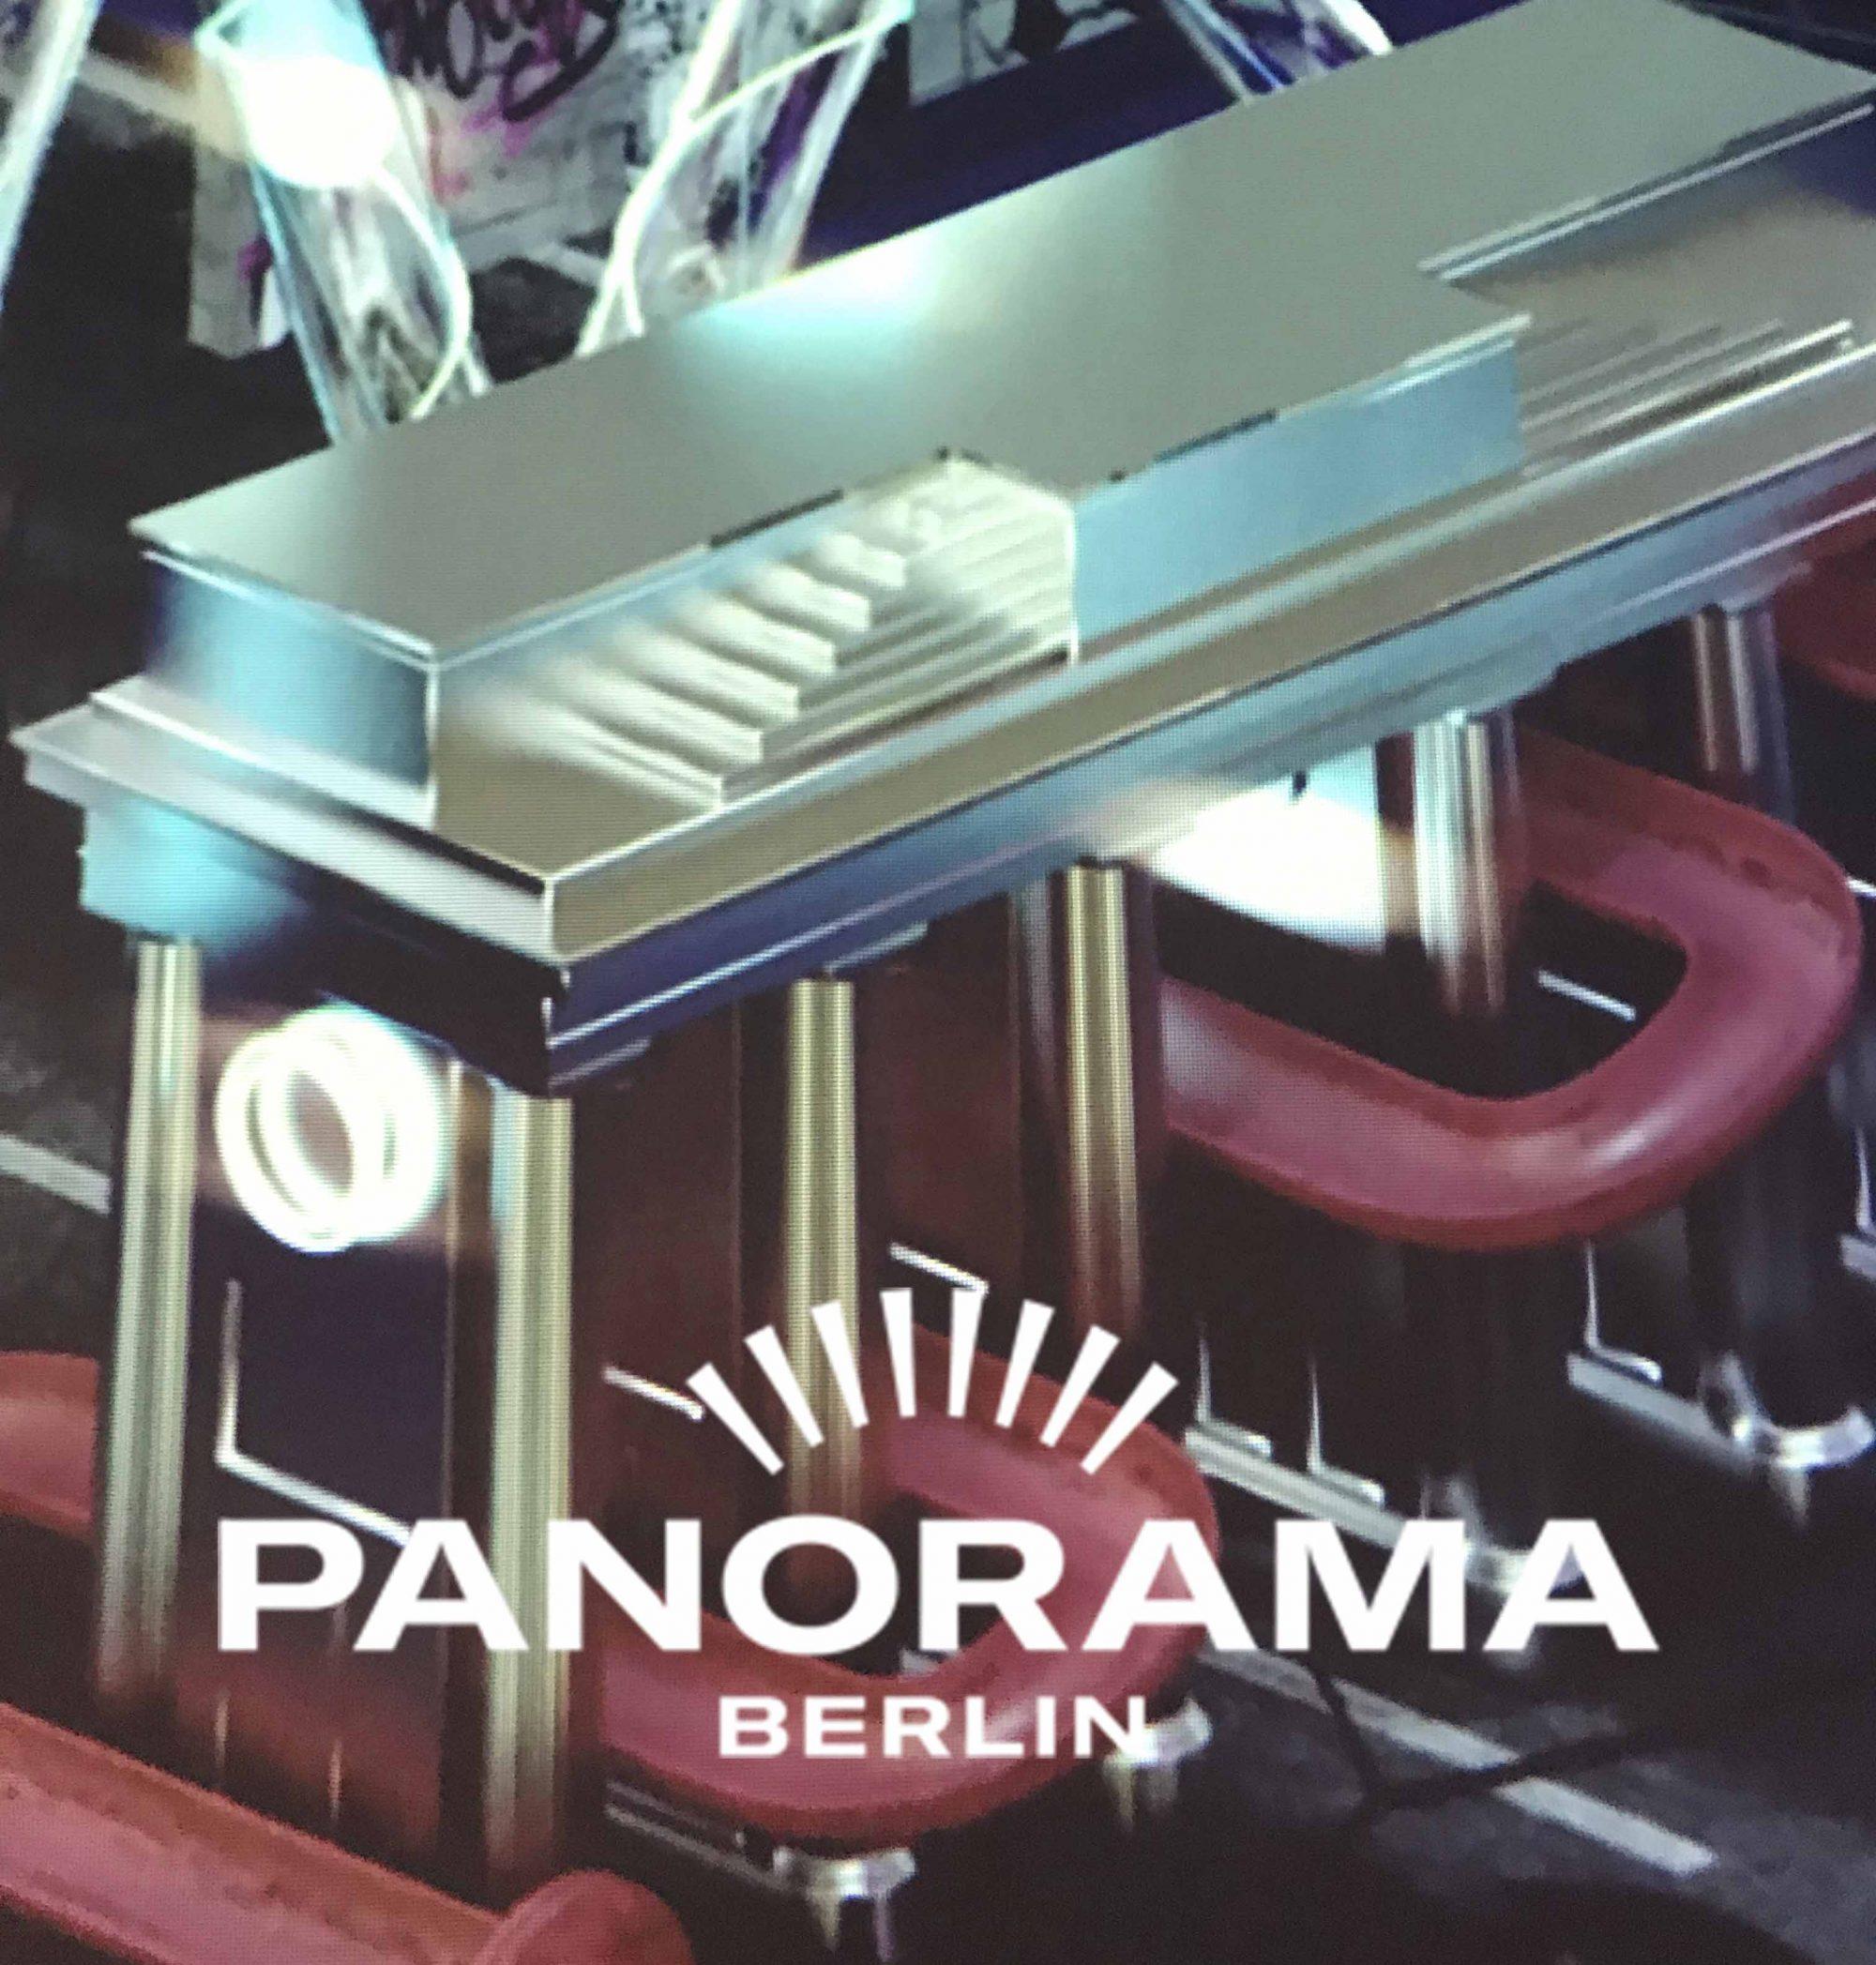 Panorama Berlin 2019